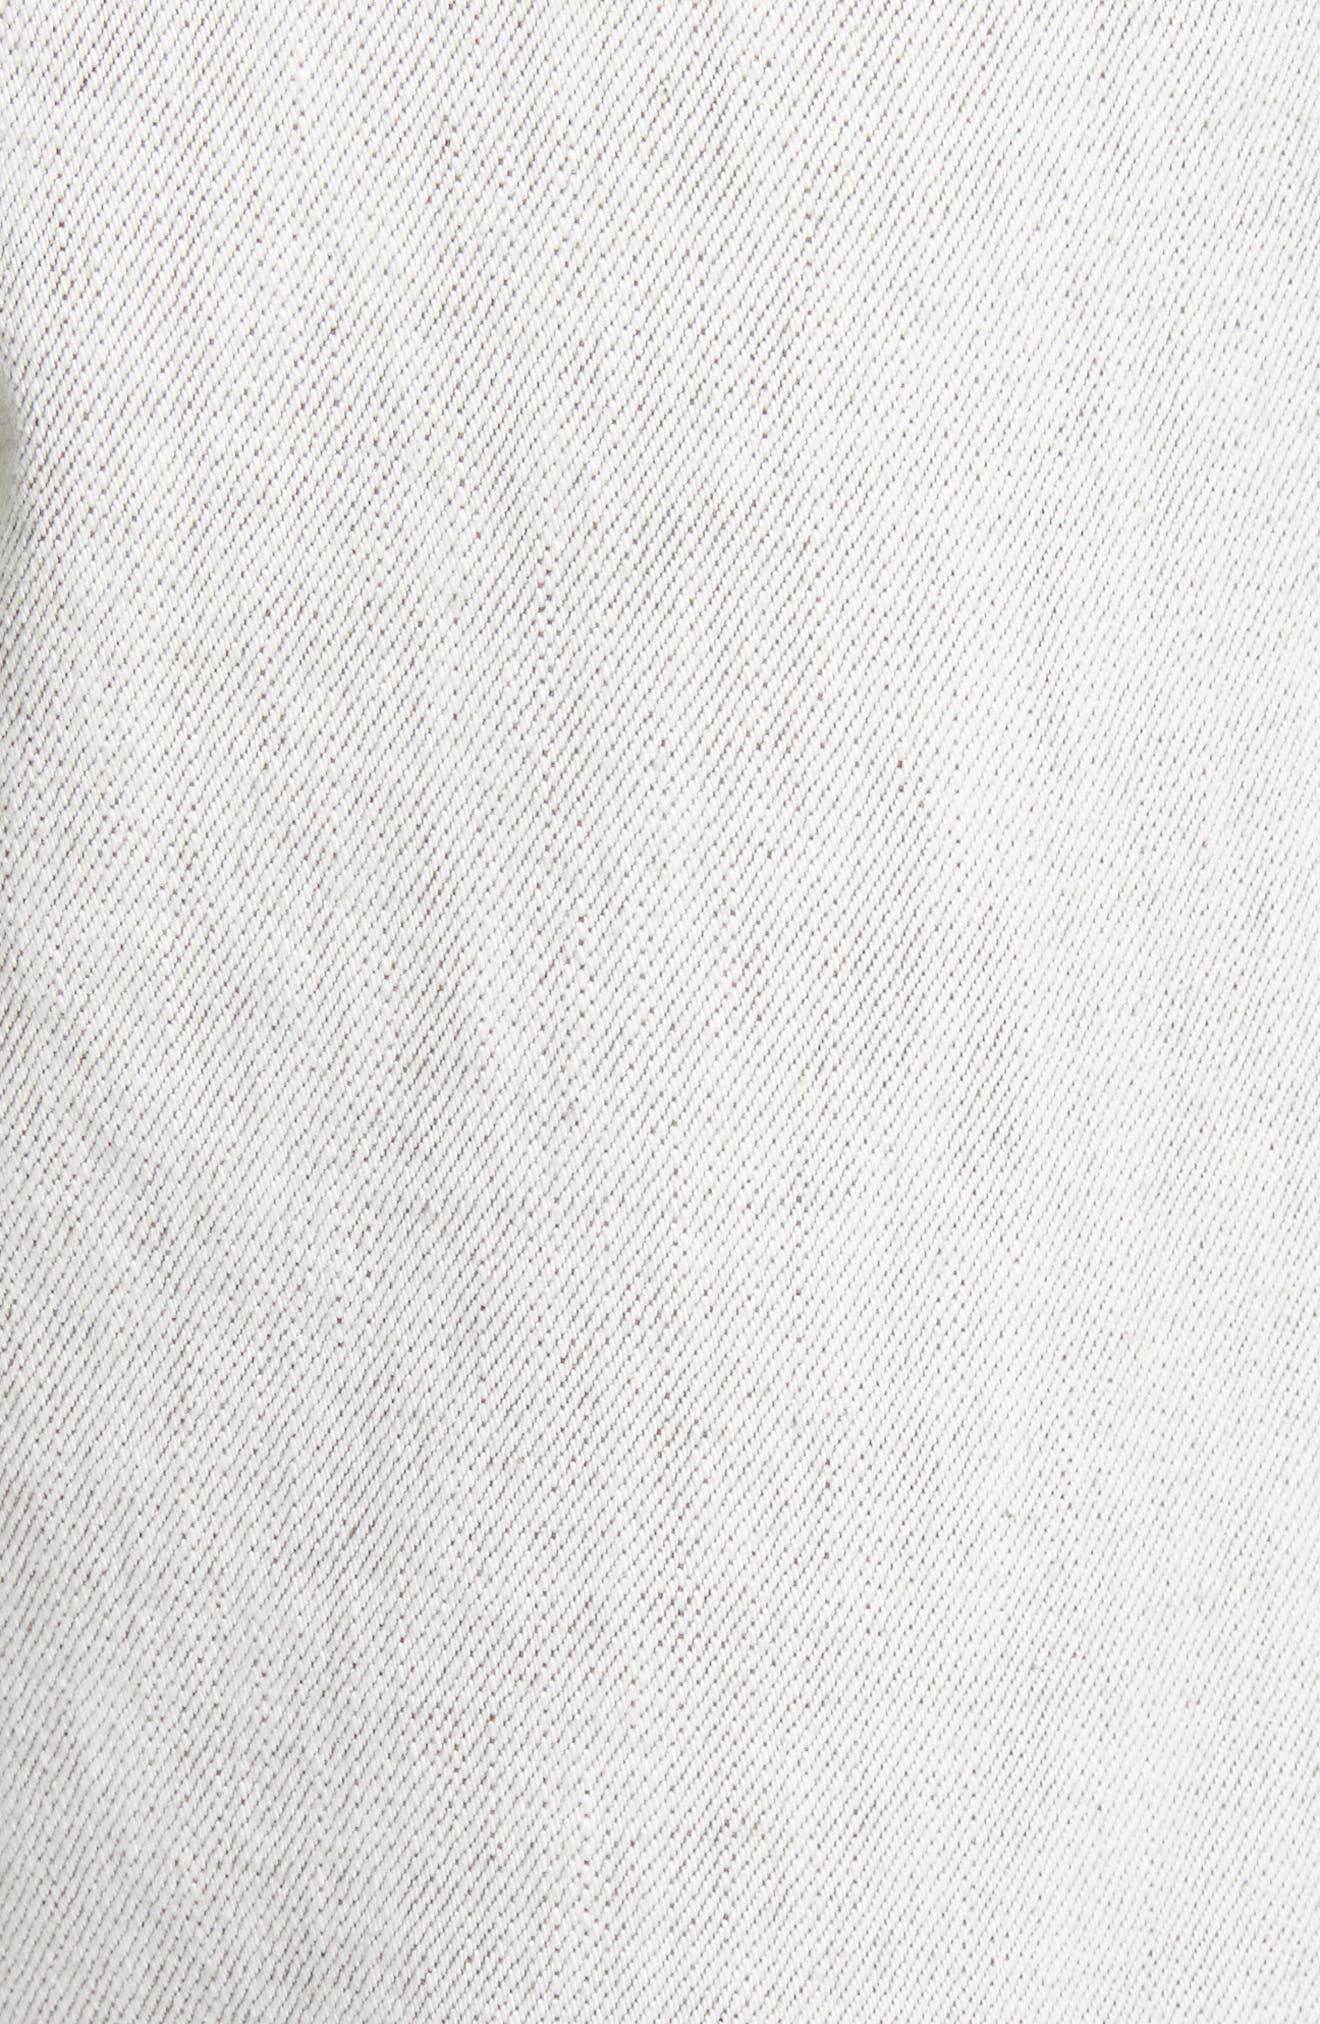 Logo Cuff Crop Jeans,                             Alternate thumbnail 5, color,                             100